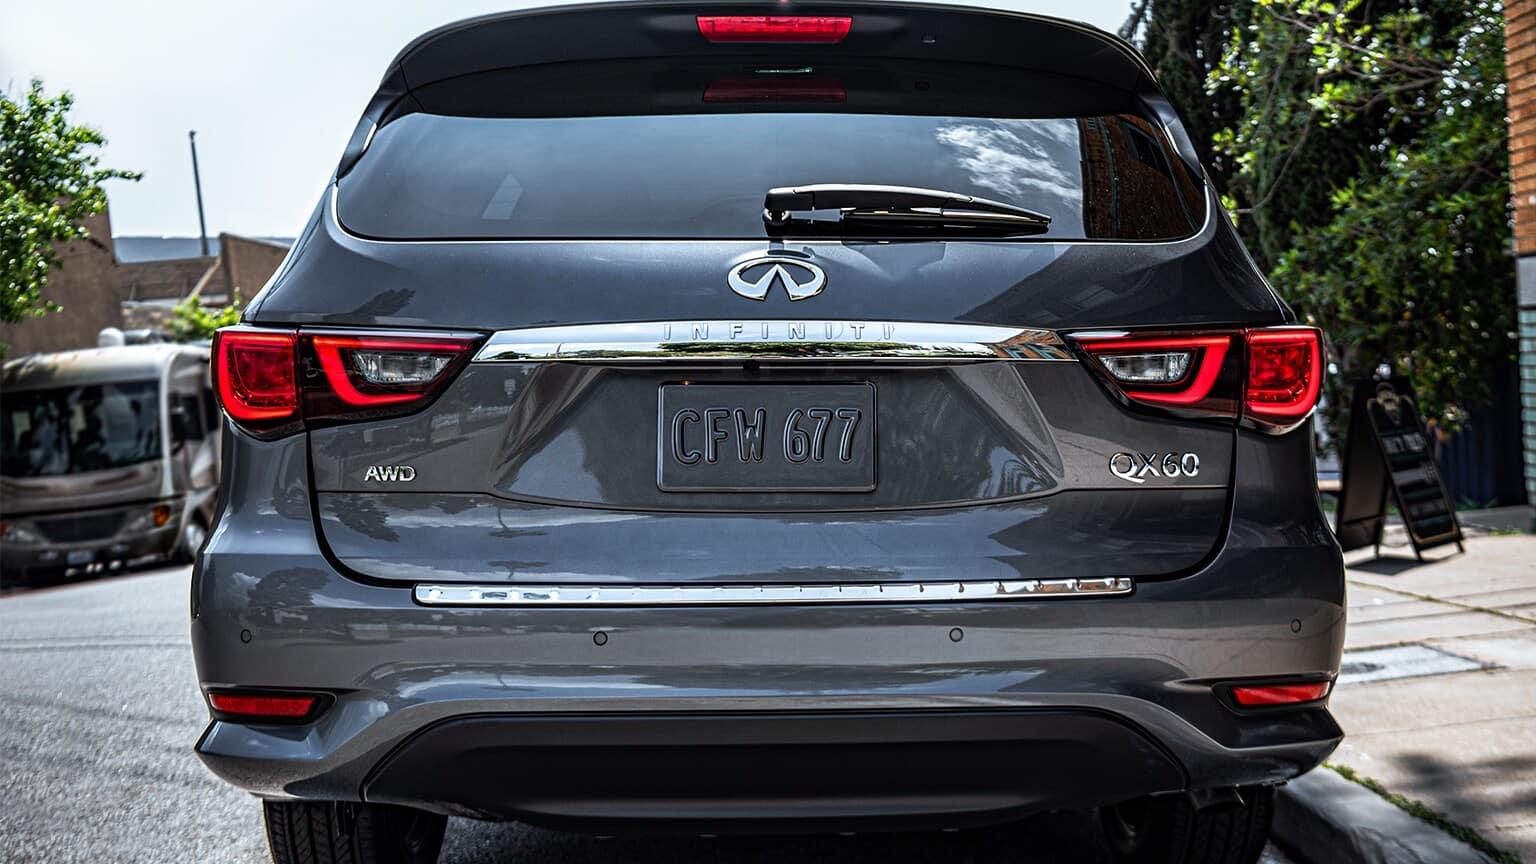 2020 INFINITI QX60 exterior graphite shadow